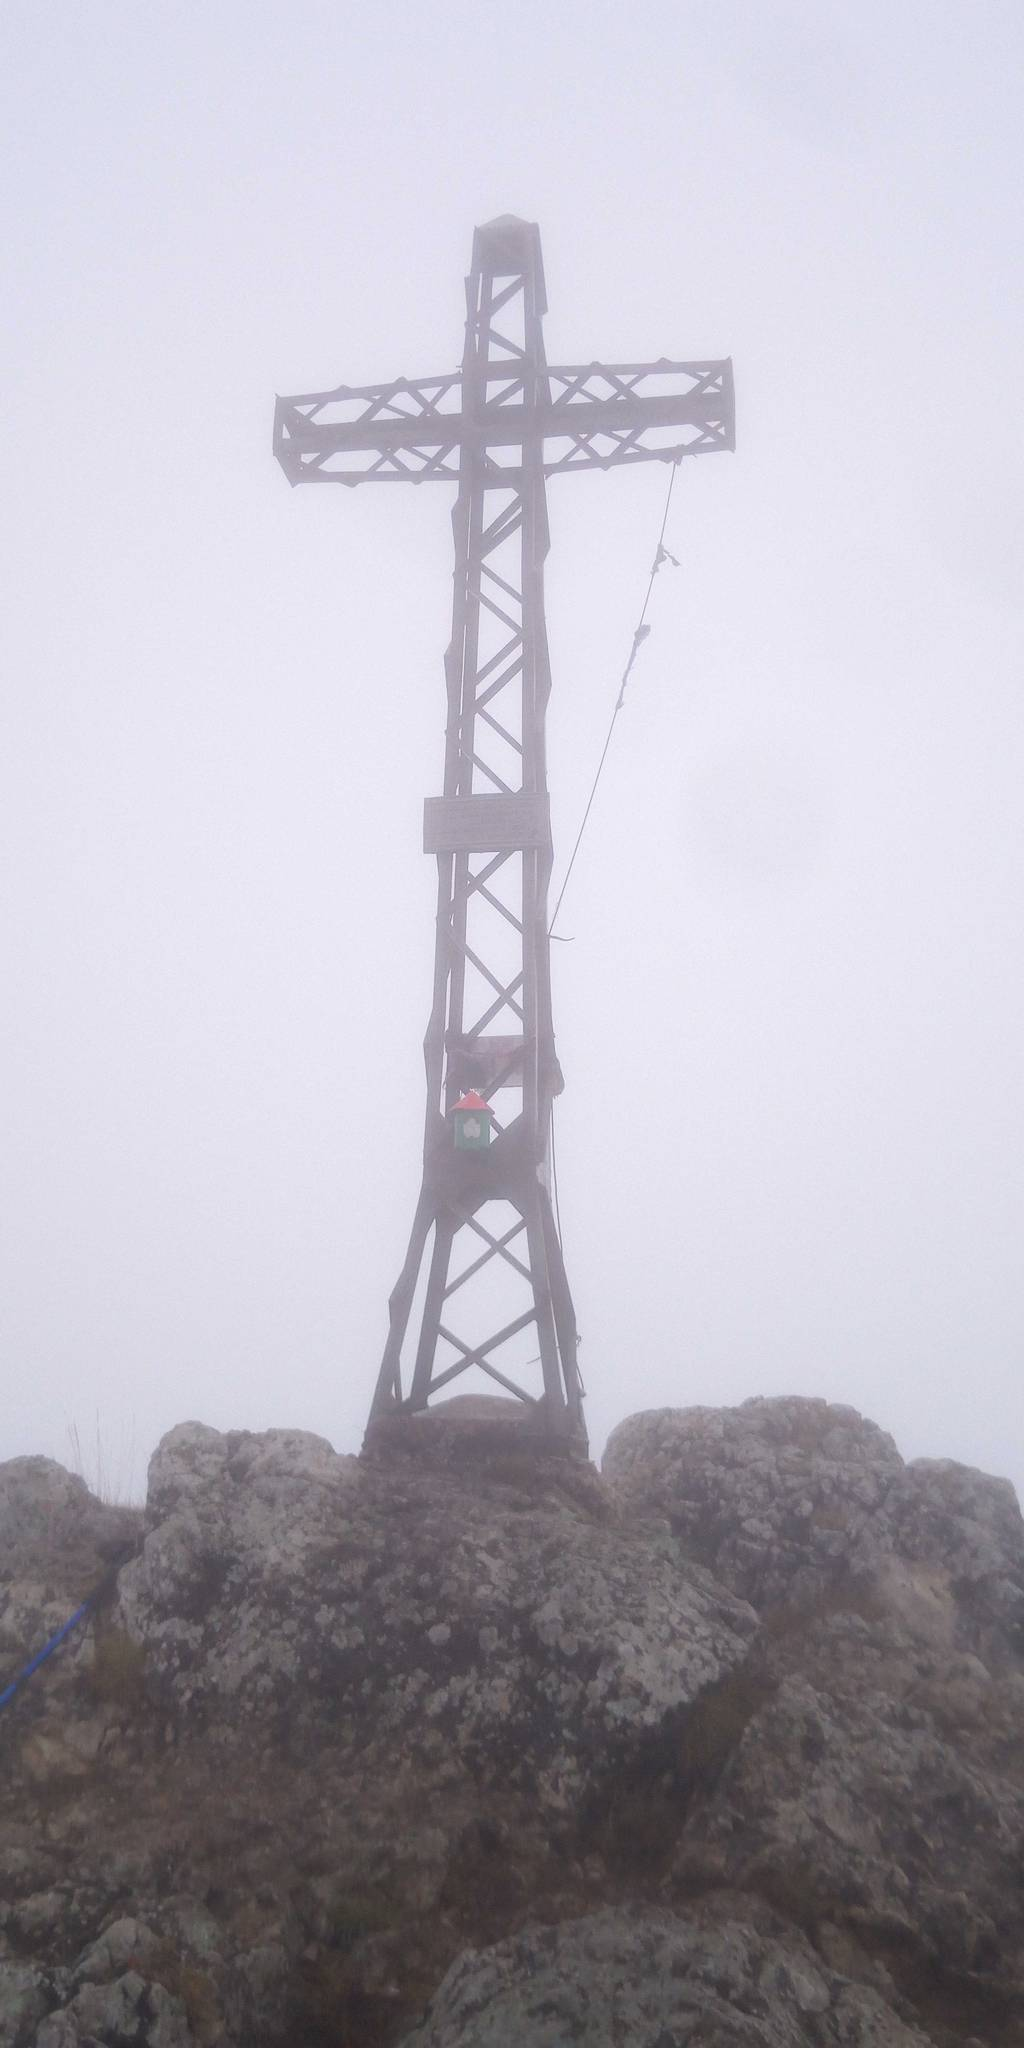 javier aldama erabiltzailea Peña (Cruz) del Castillo puntan, 2020-08-02 12:29